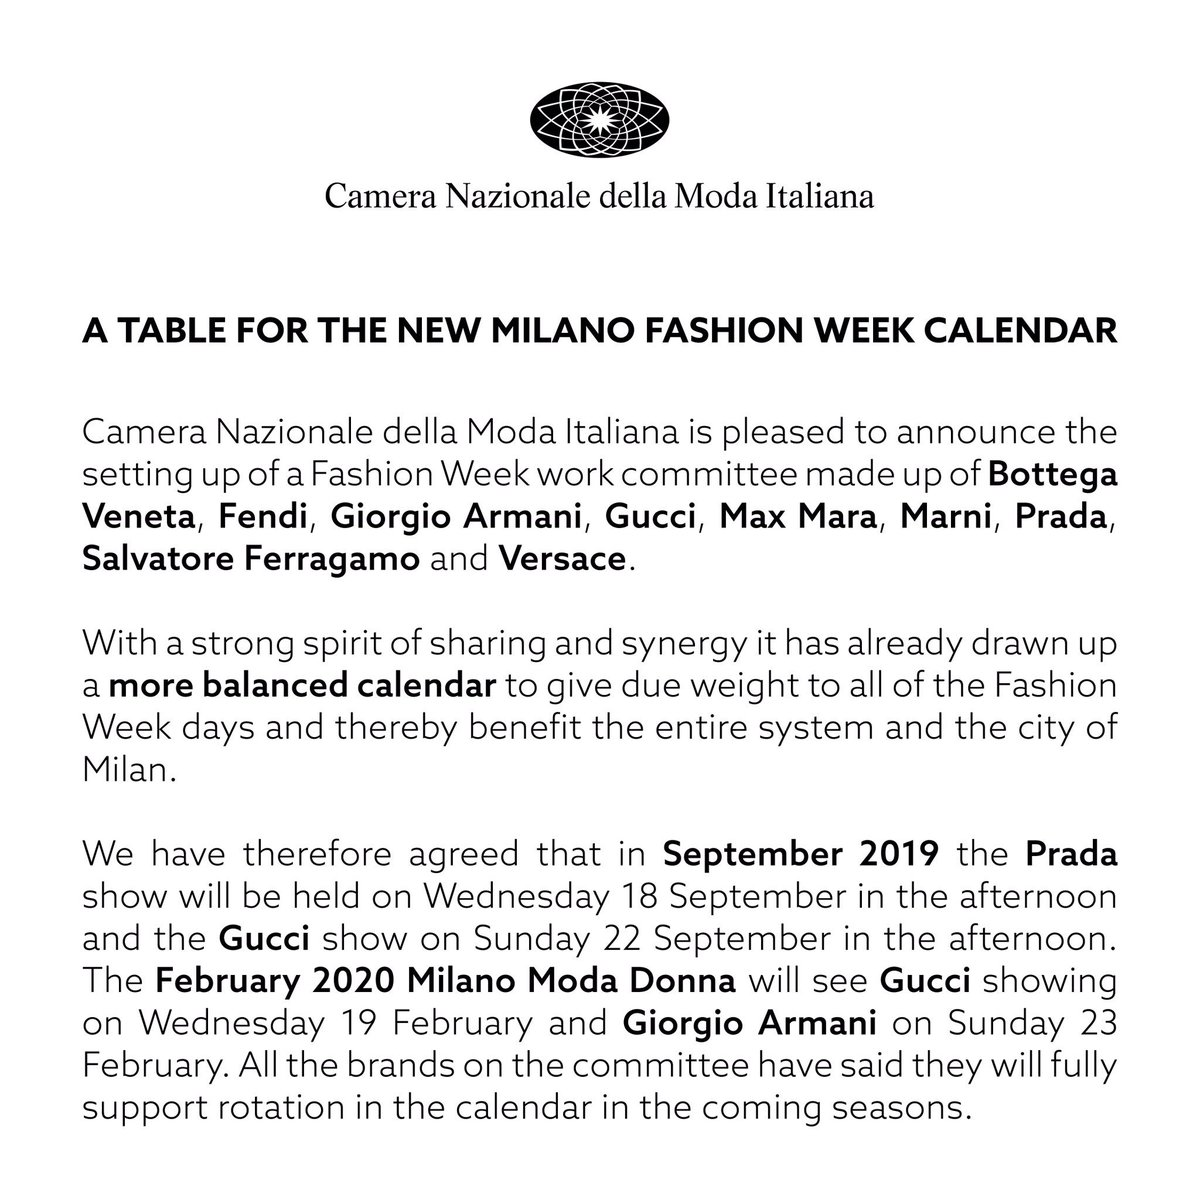 February 2020 Fashion Calendar cameramoda on Twitter: